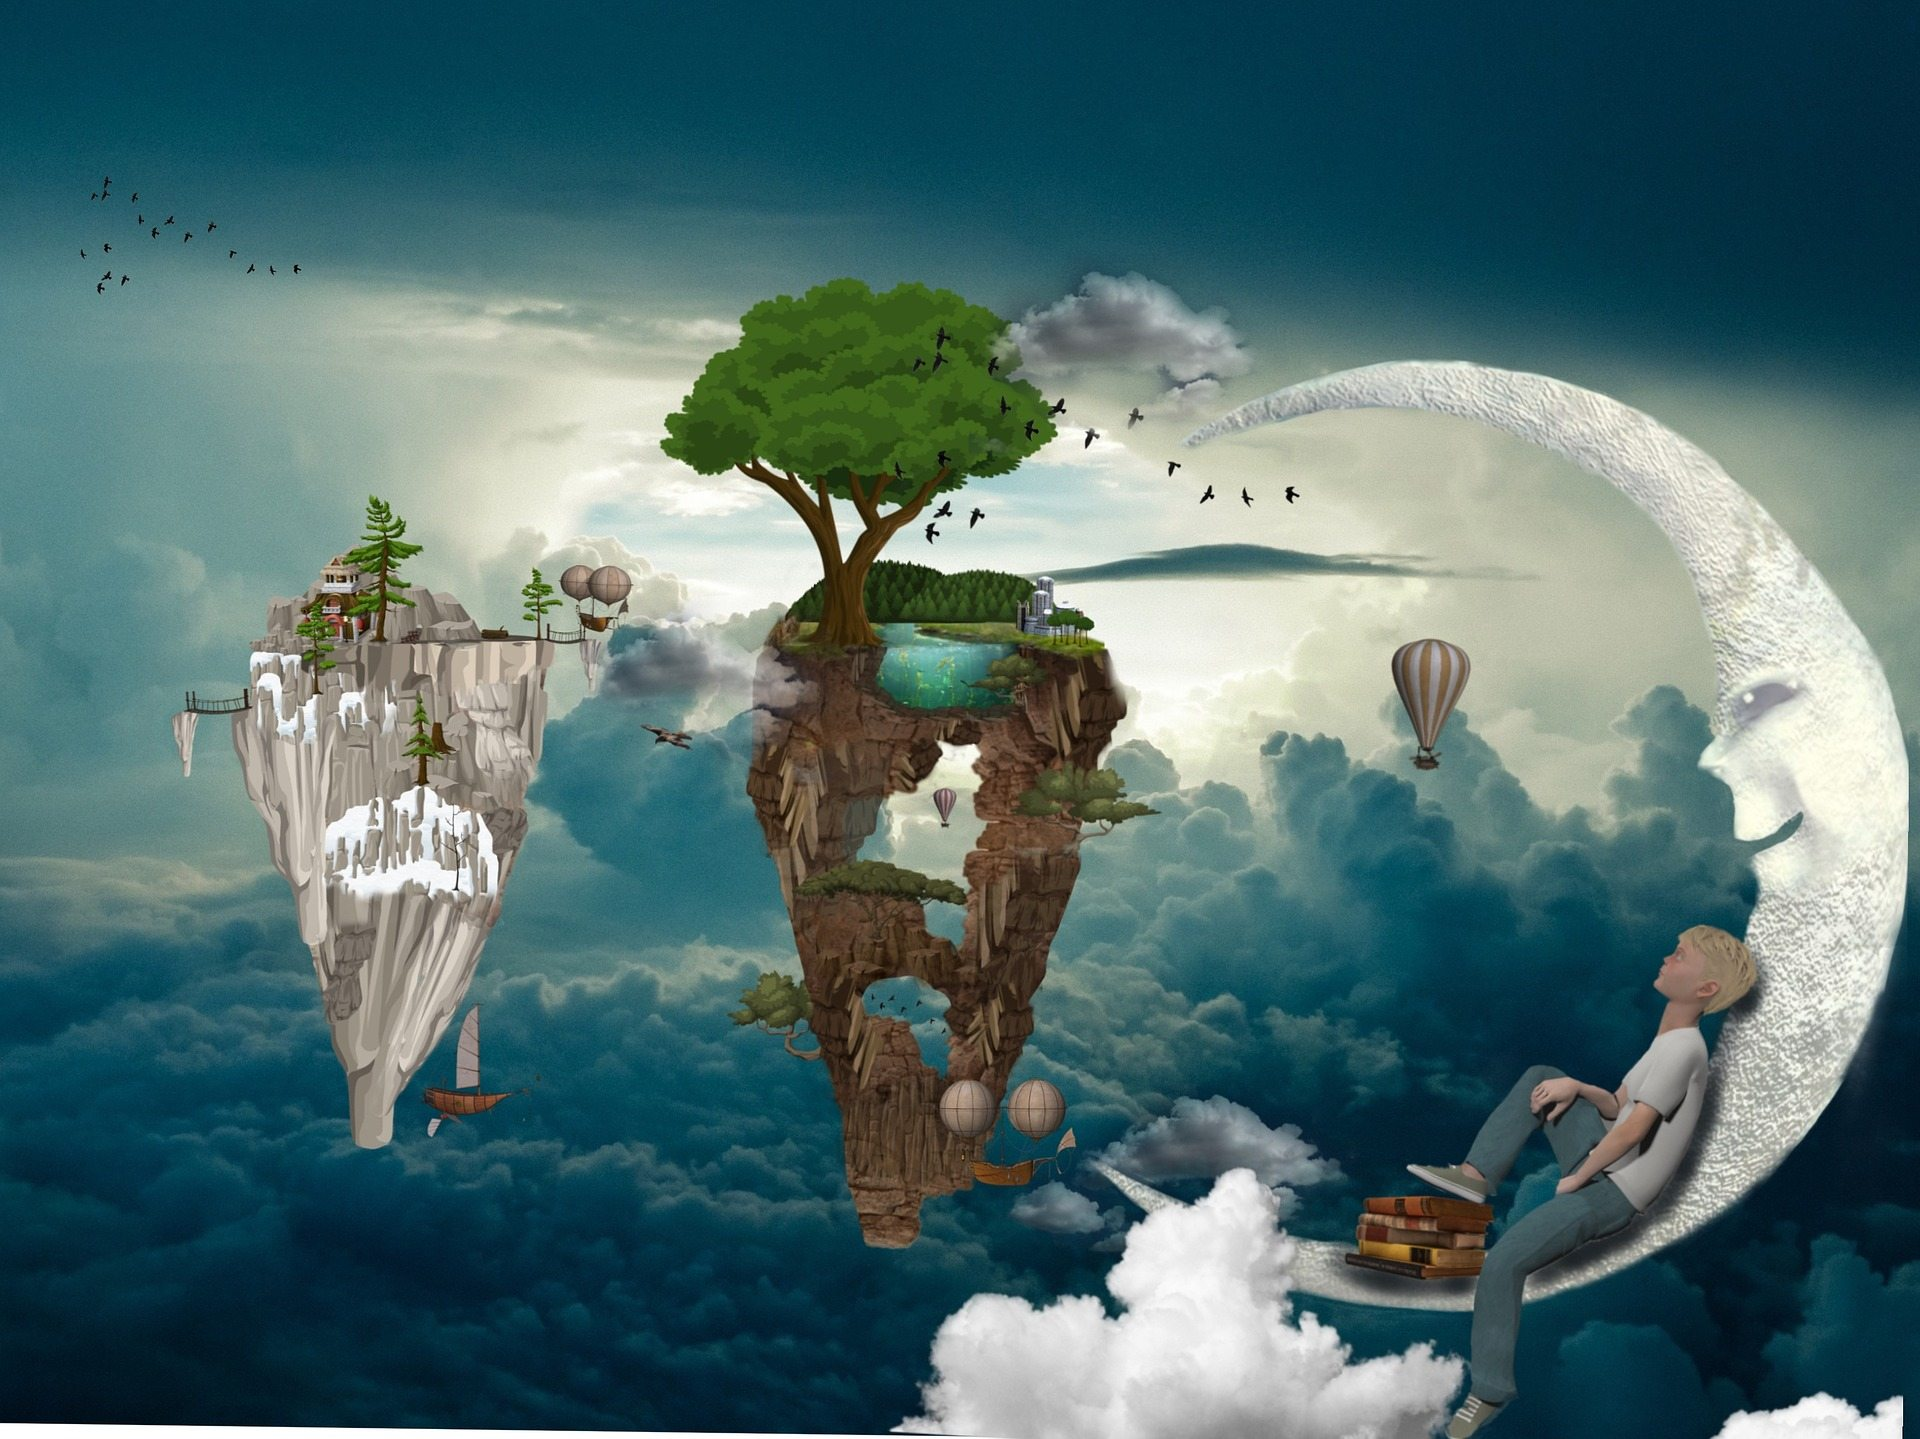 Mystery world of Dreams